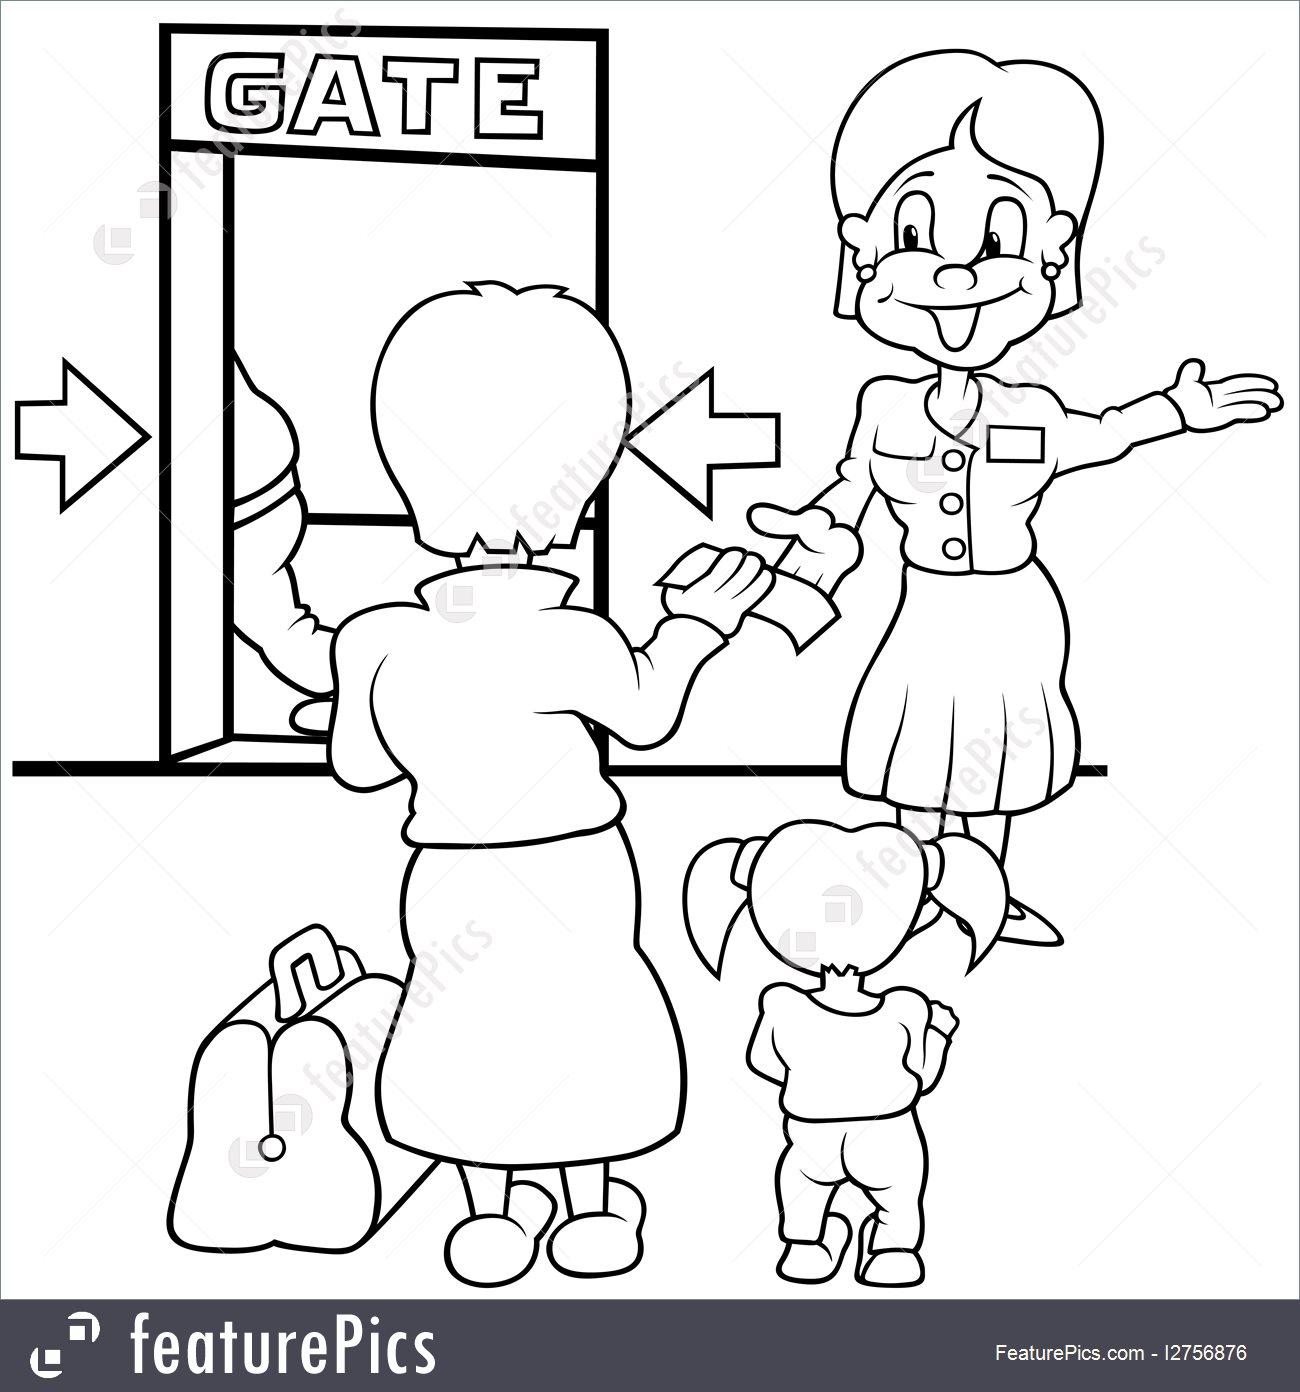 Airport clipart drawing. At getdrawings com free